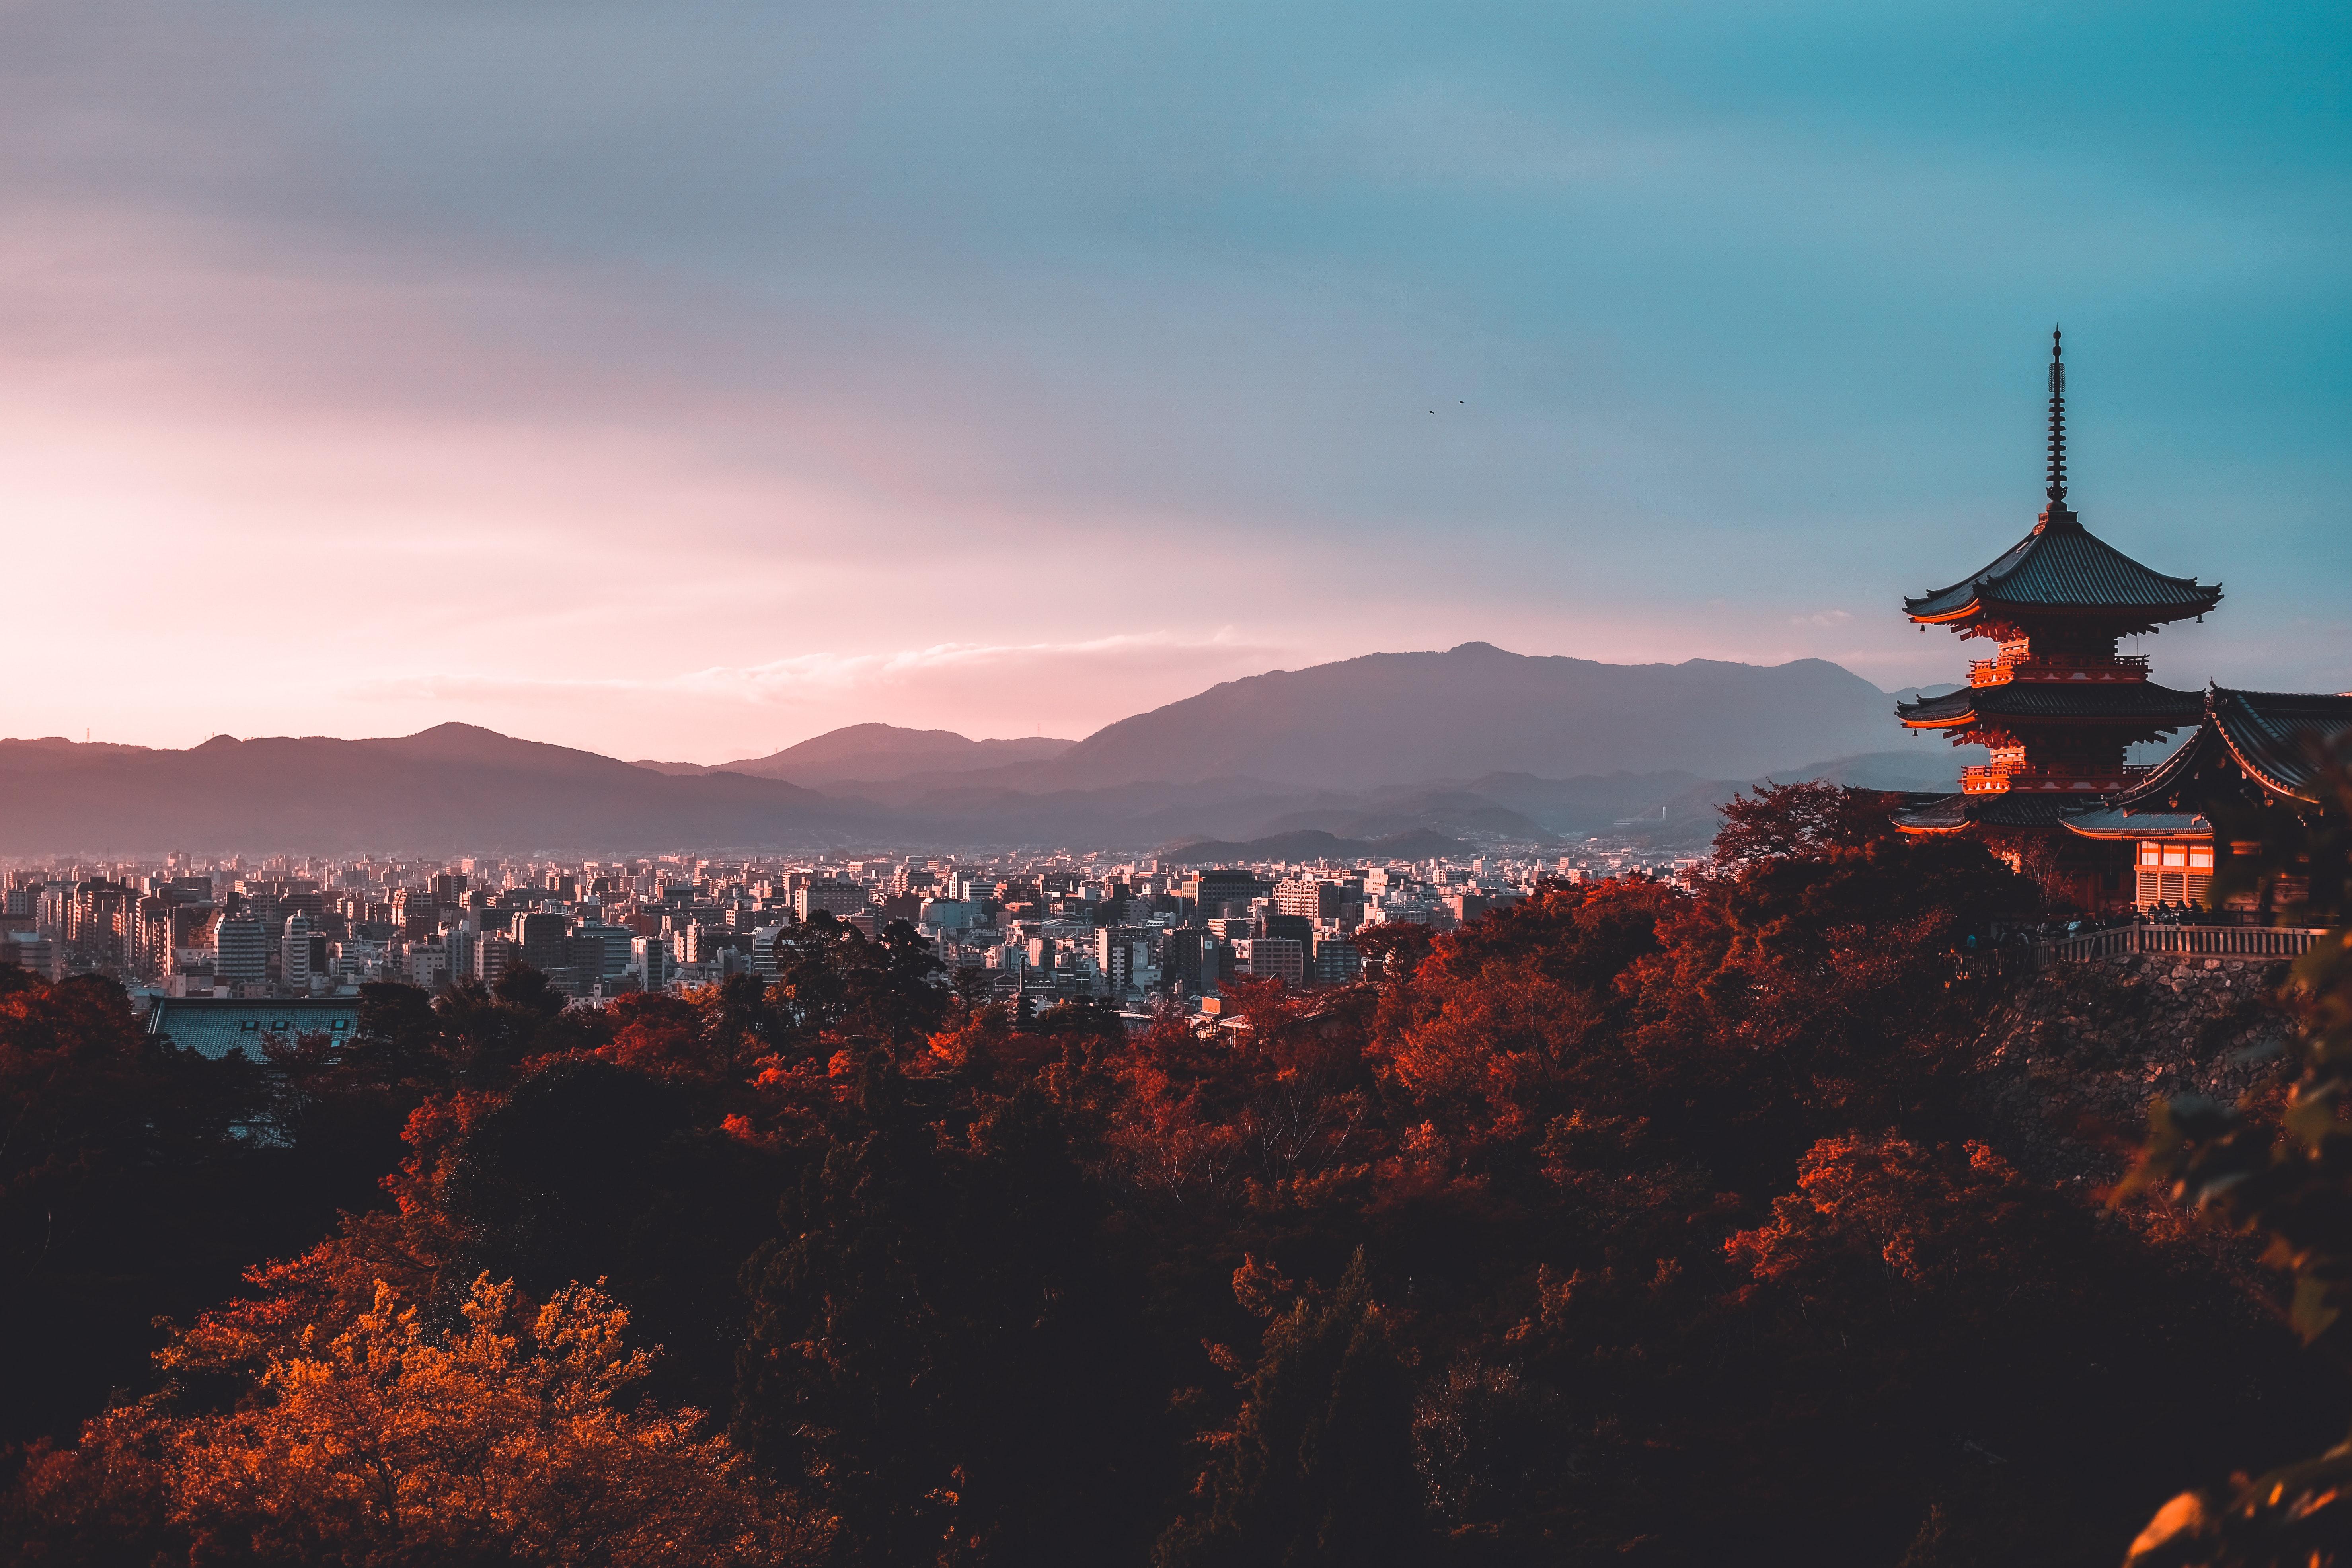 New U Life Opens Japan as an NFR Market